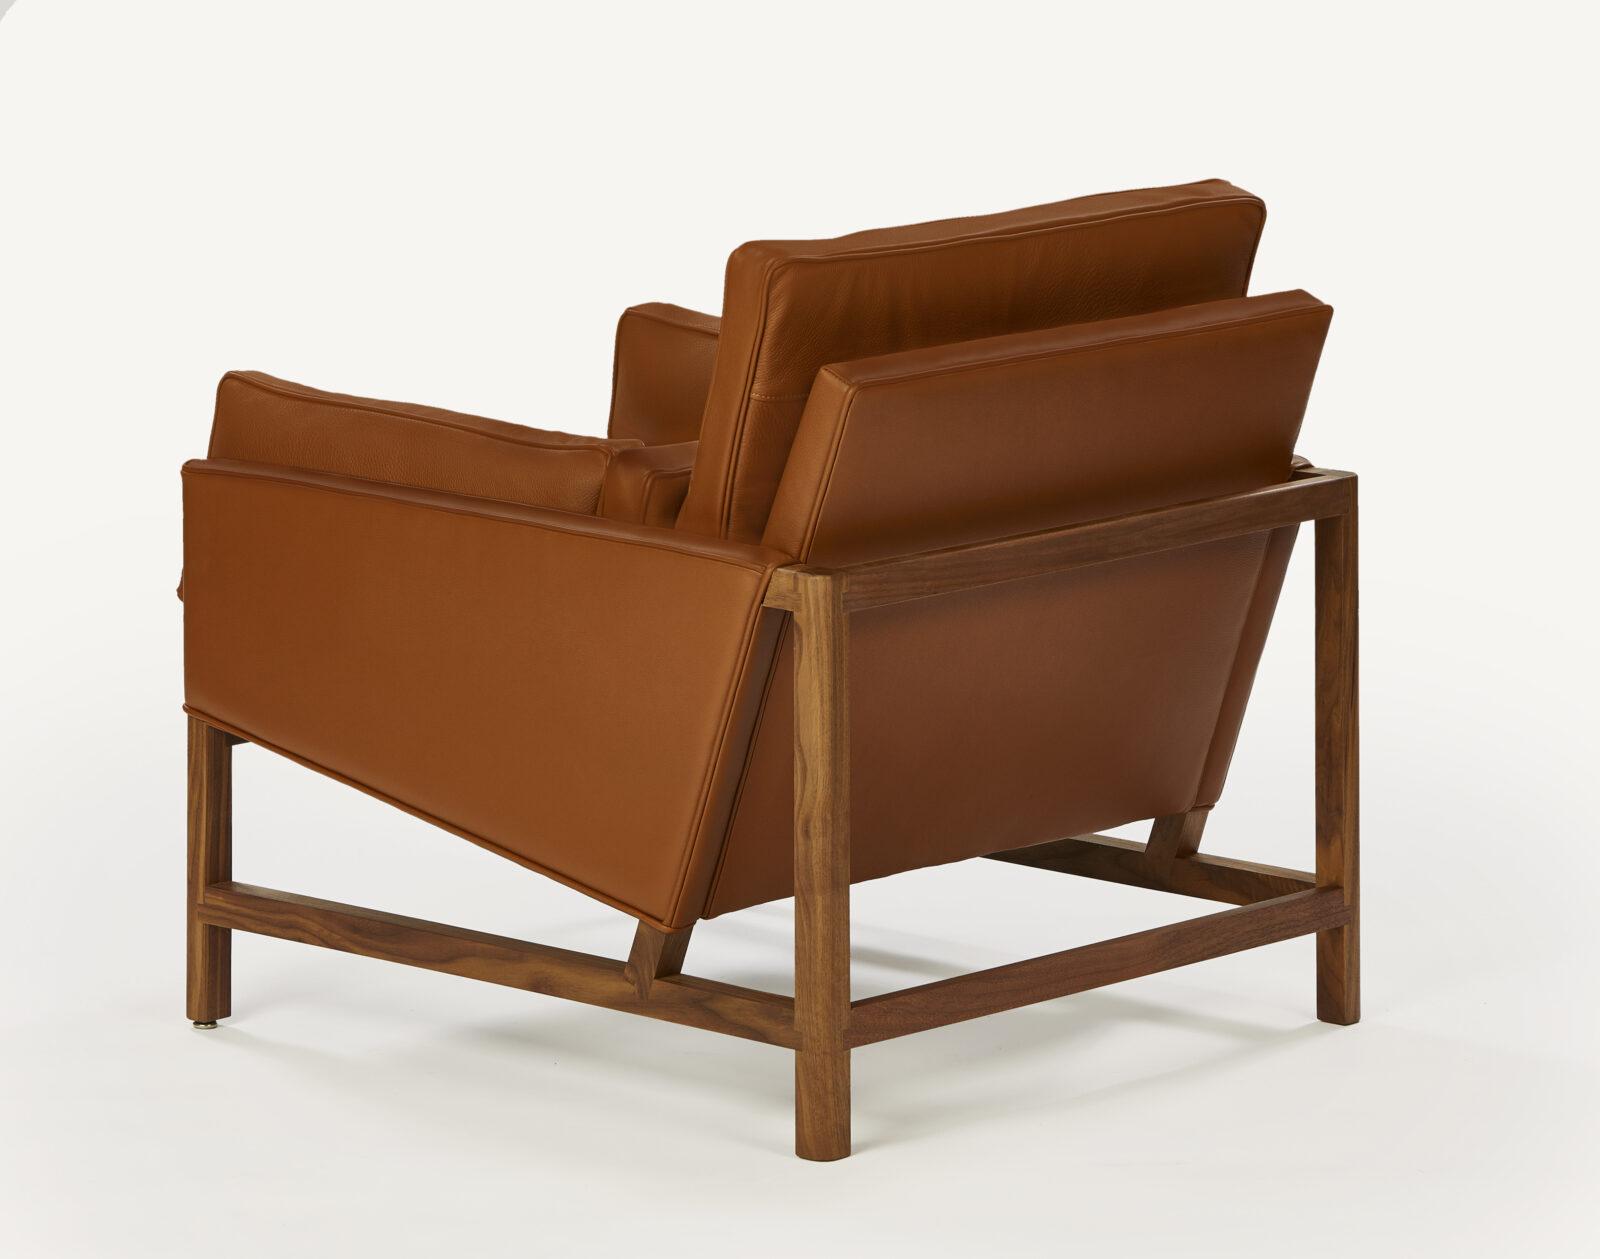 BassamFellows CB-50 Low Back Lounge Chair with solid Walnut frame, credit, ELDON ZIMMERMAN